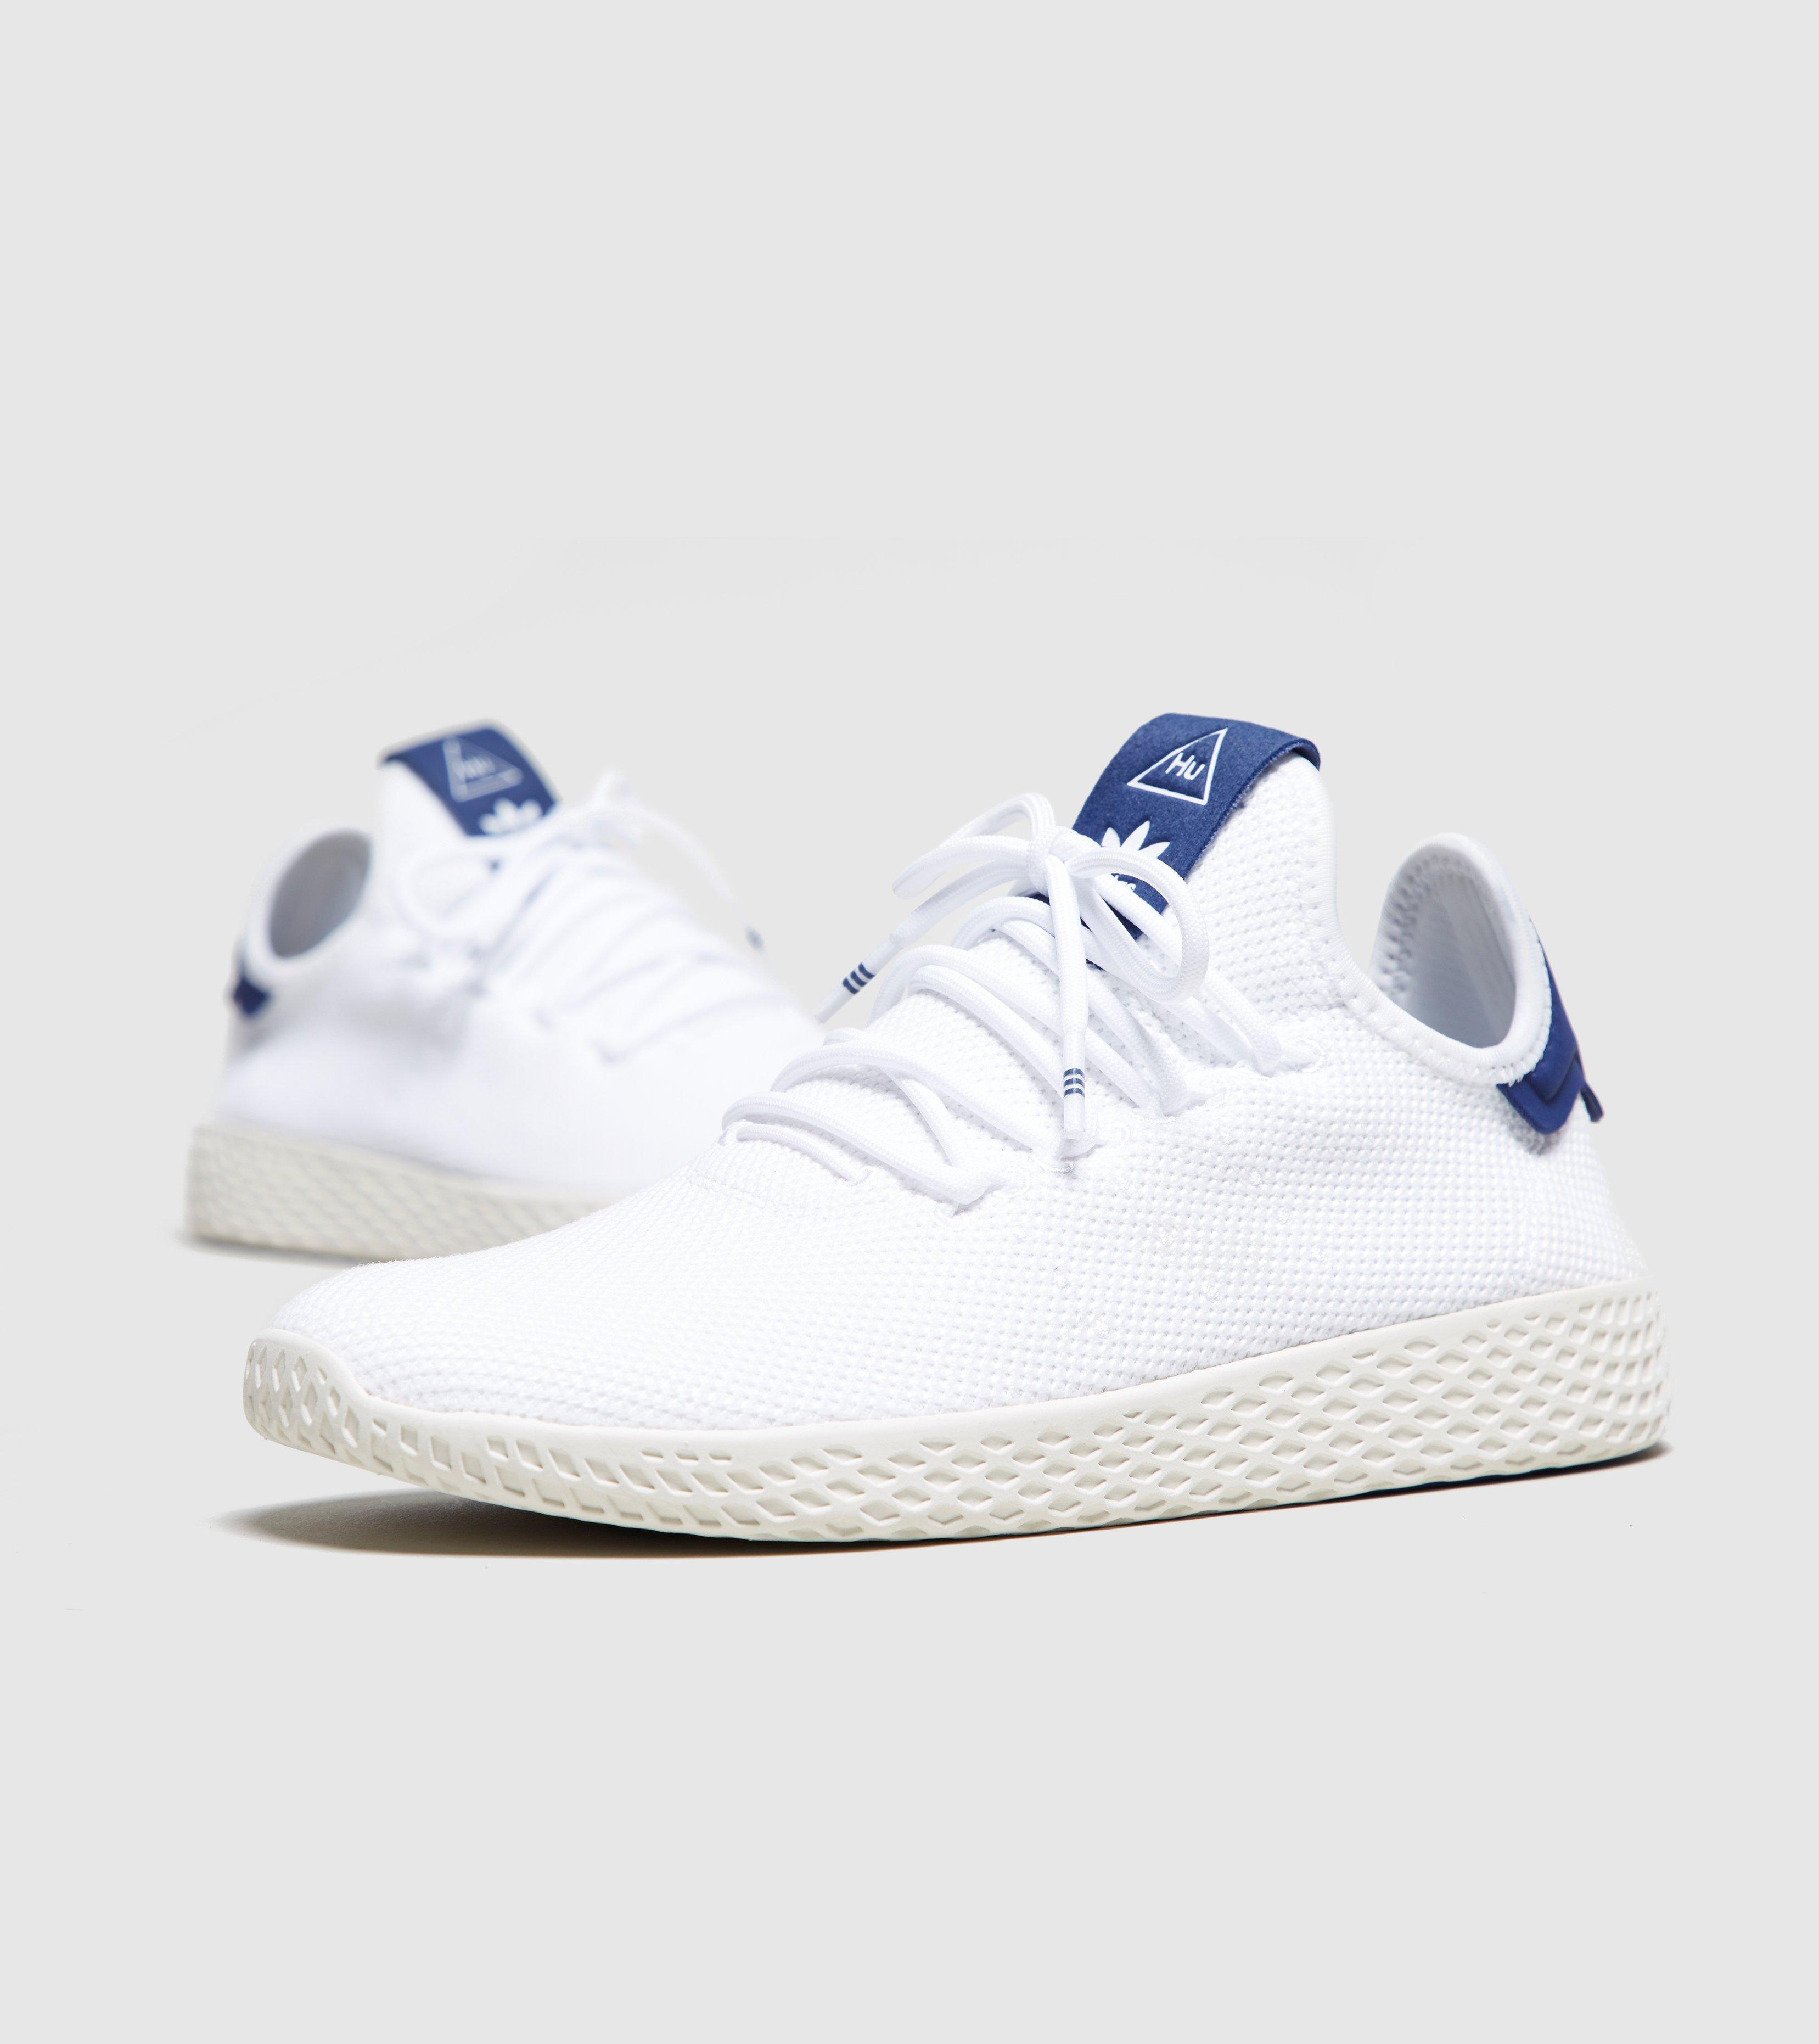 027780edde966 adidas Originals X Pharrell Williams Tennis Hu Women s - Lyst